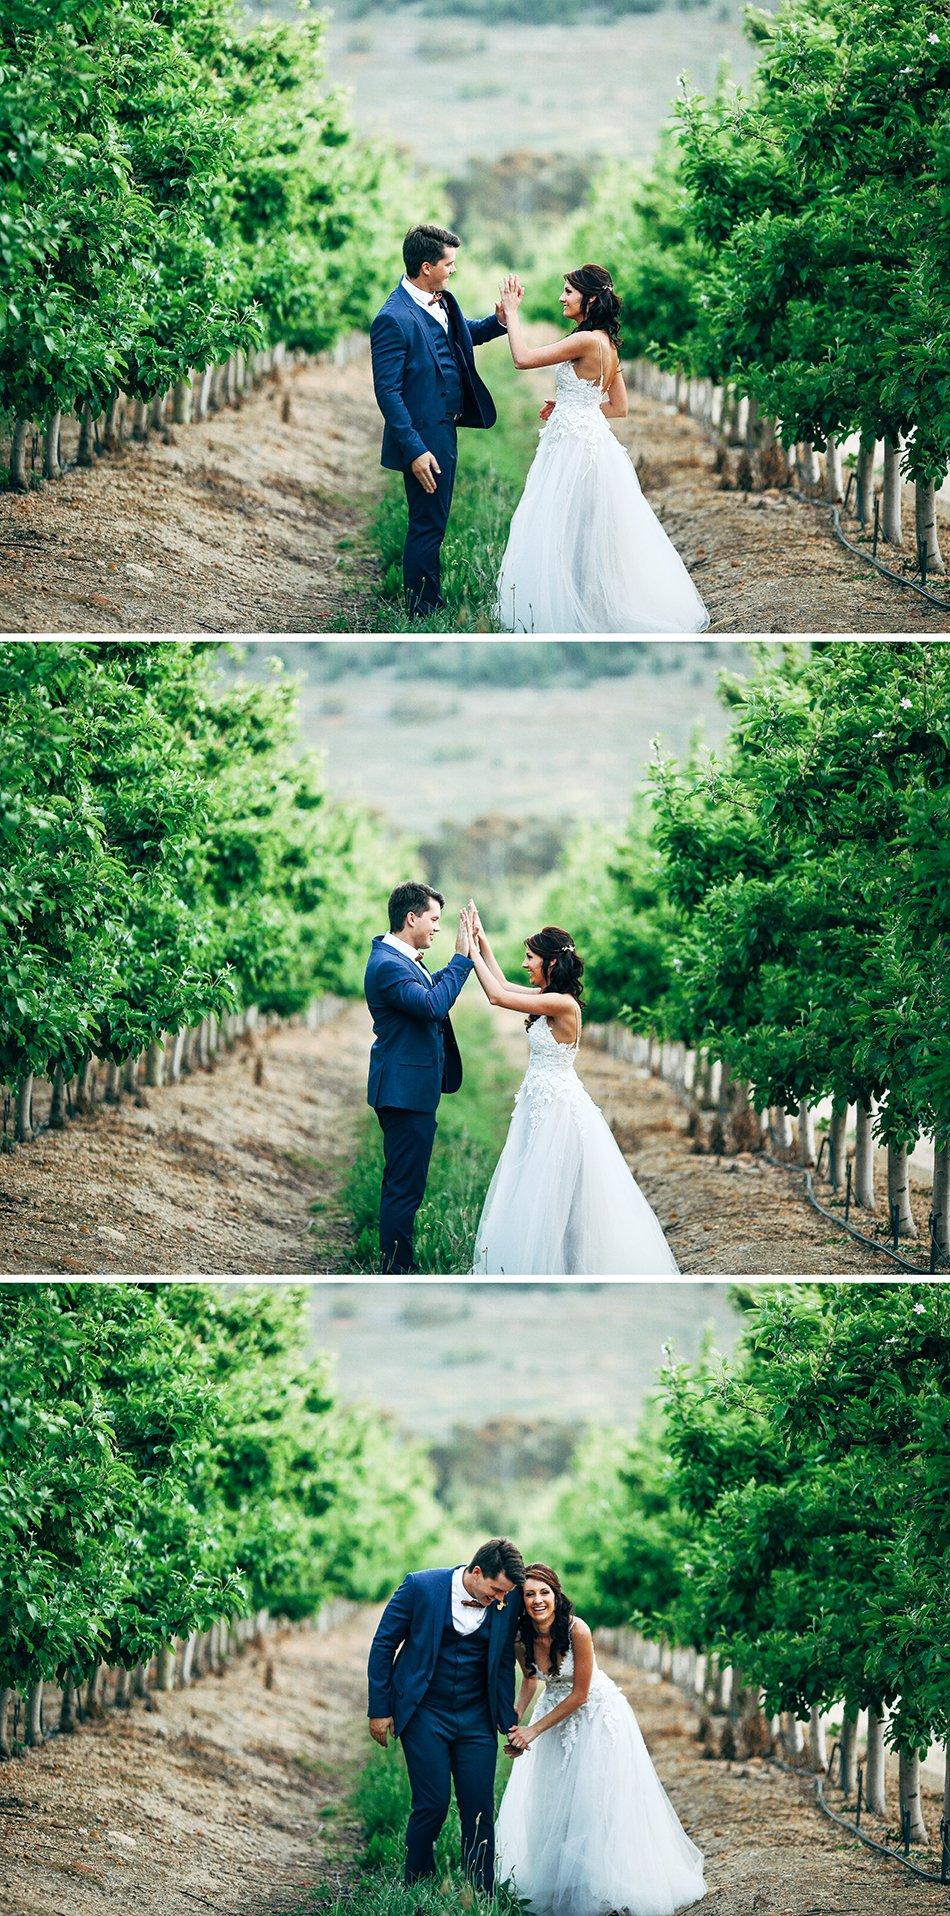 Michelle&Waldi -- Married@Old Mac Daddy, Elgin Valley-2447